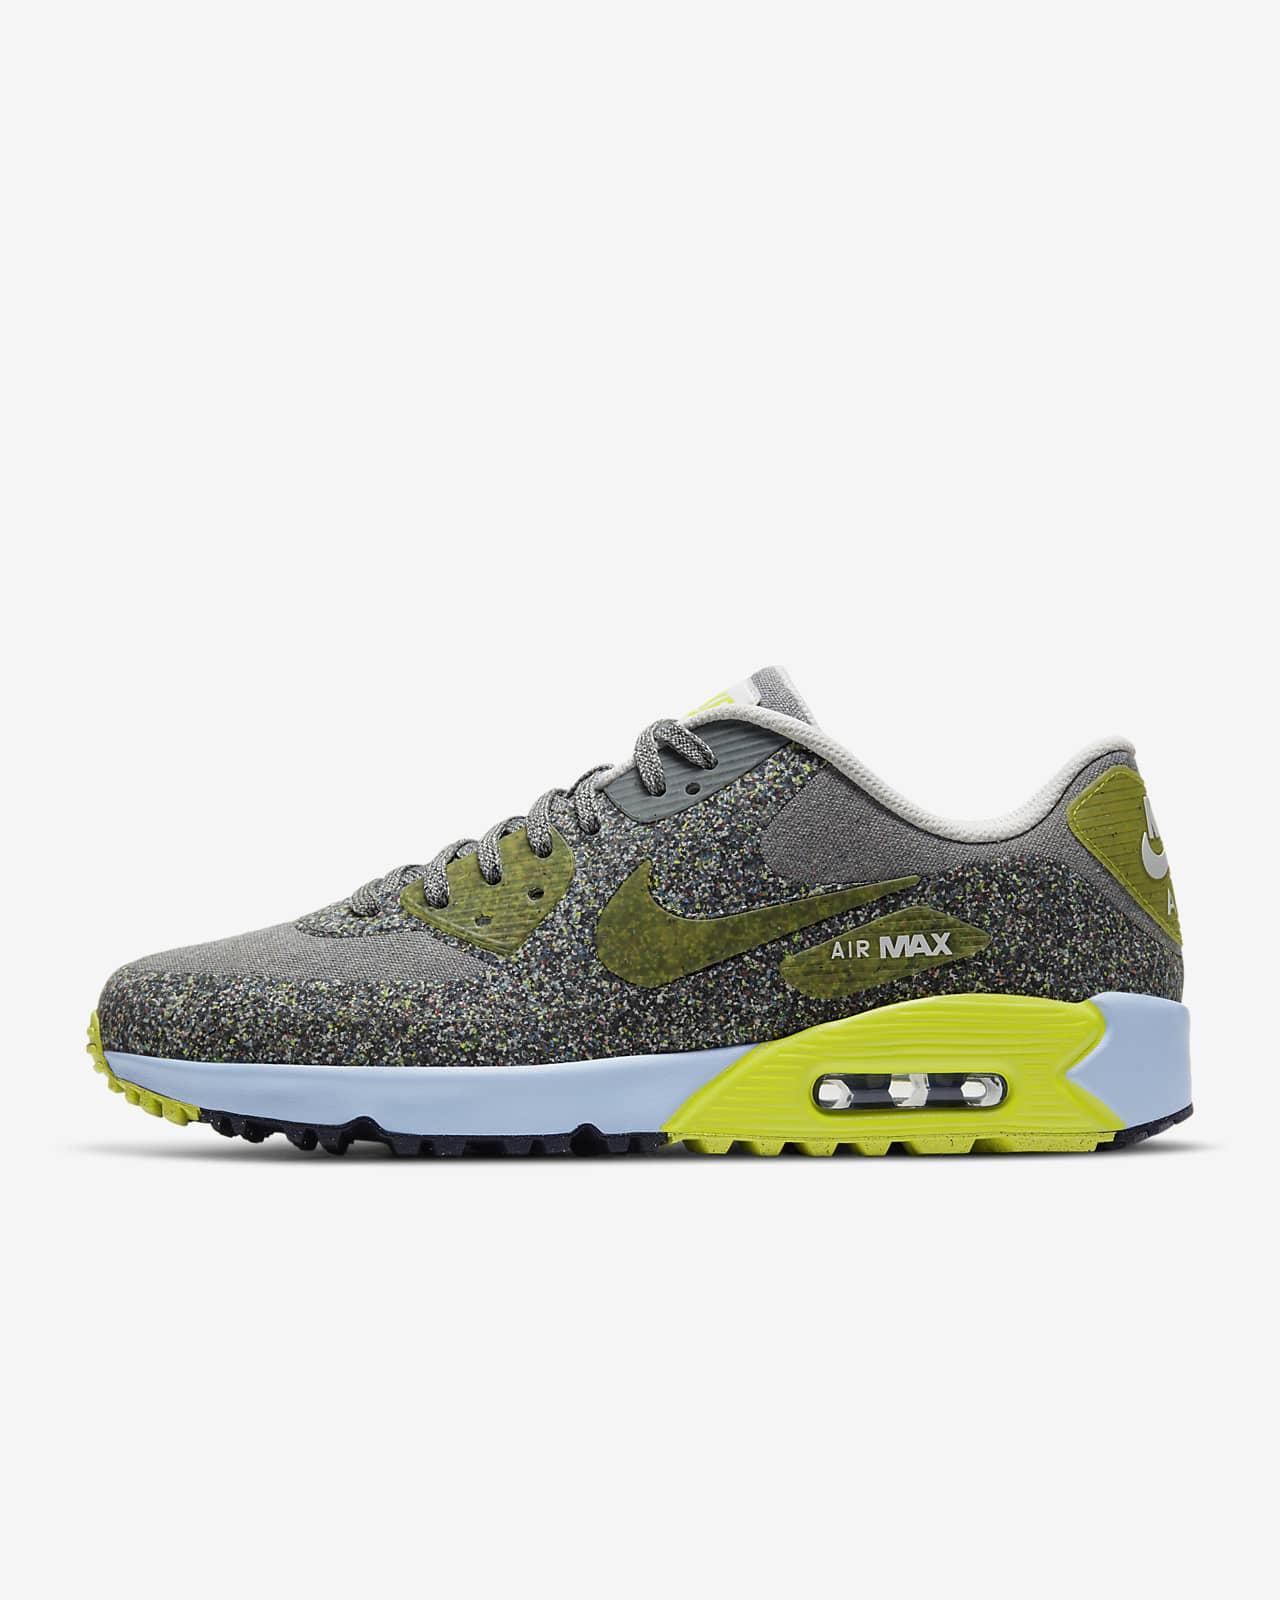 Calzado de golf Nike Air Max 90 G NRG